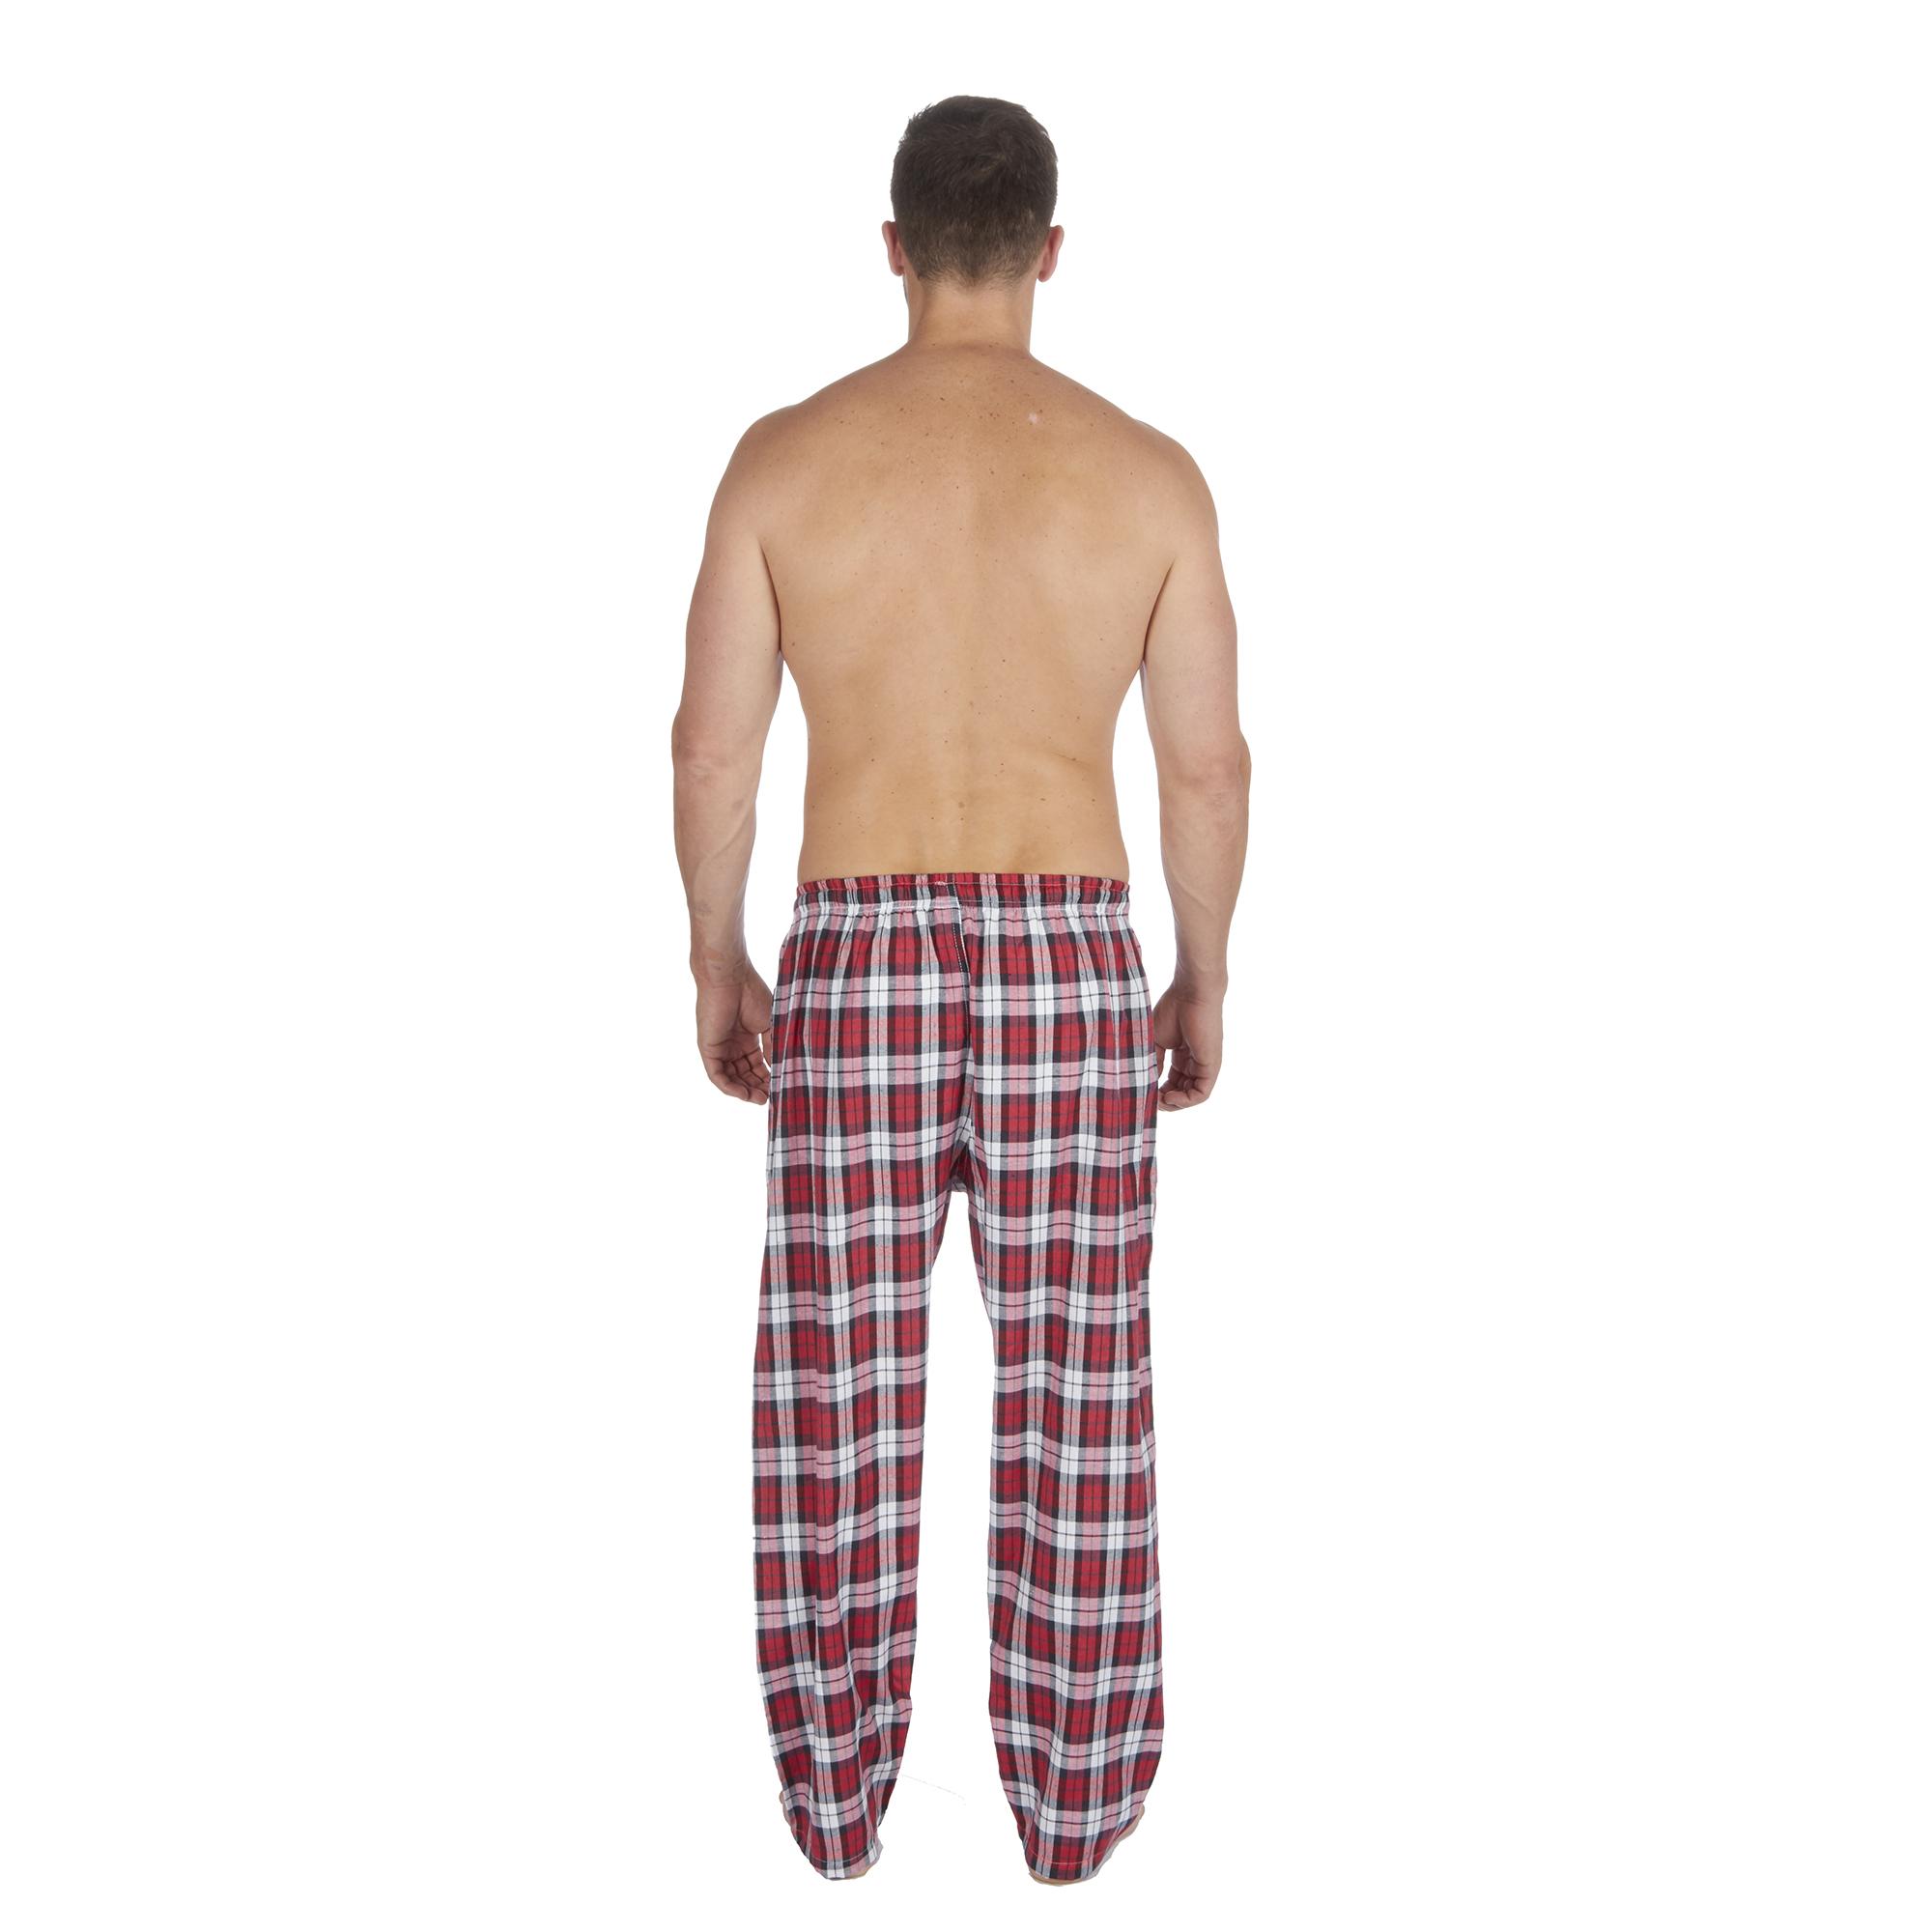 Jason-Jones-Homme-Carreaux-Tisse-Pyjama-Pantalon-en-Coton-Melange-Serge-PJ-Lounge-Pants miniature 29